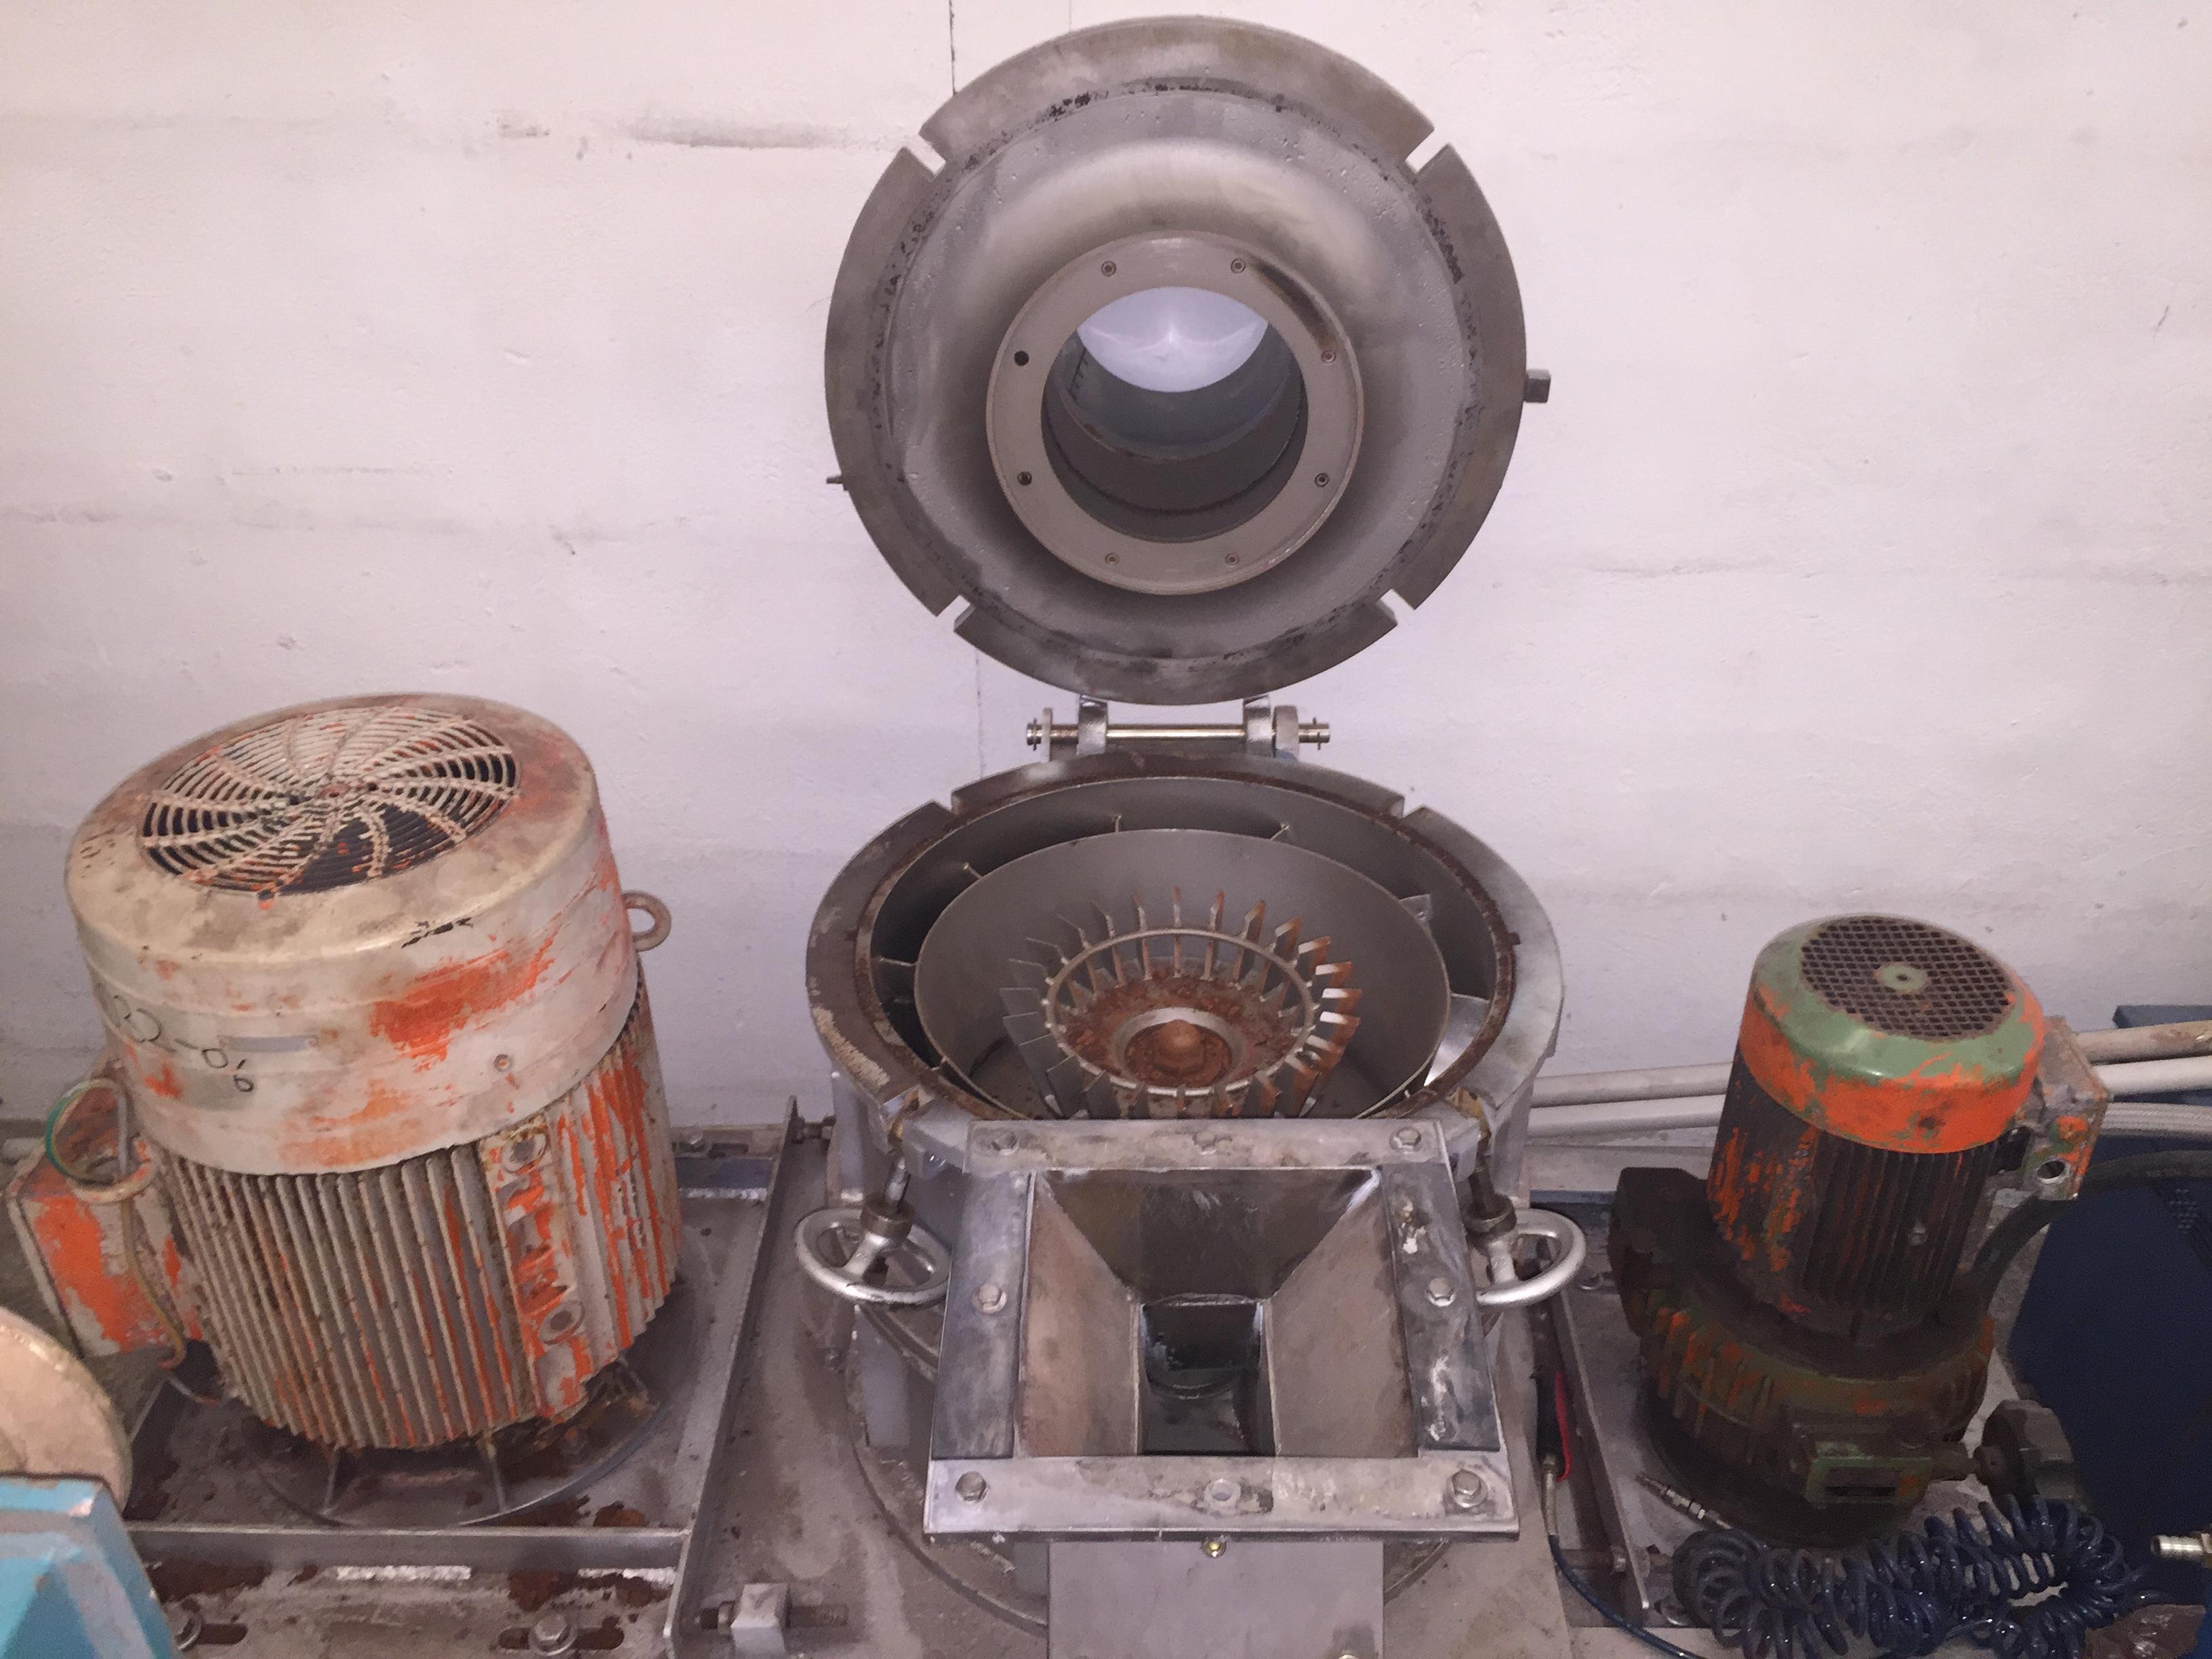 Hosokawa alpine micron proces acm 40 grinder exapro for Alpine cuisine meat grinder